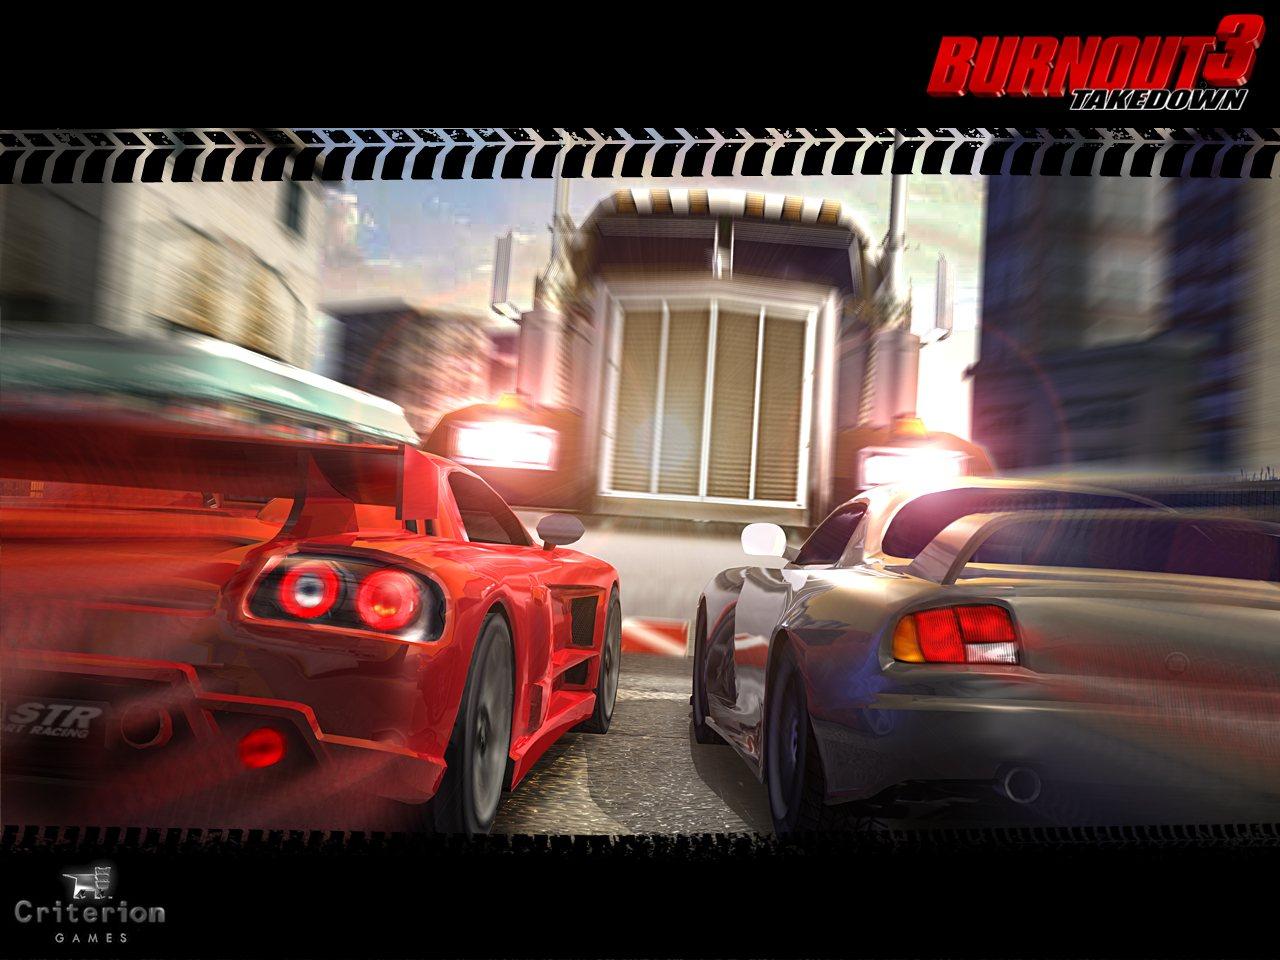 Burnout 3 takedown iso download